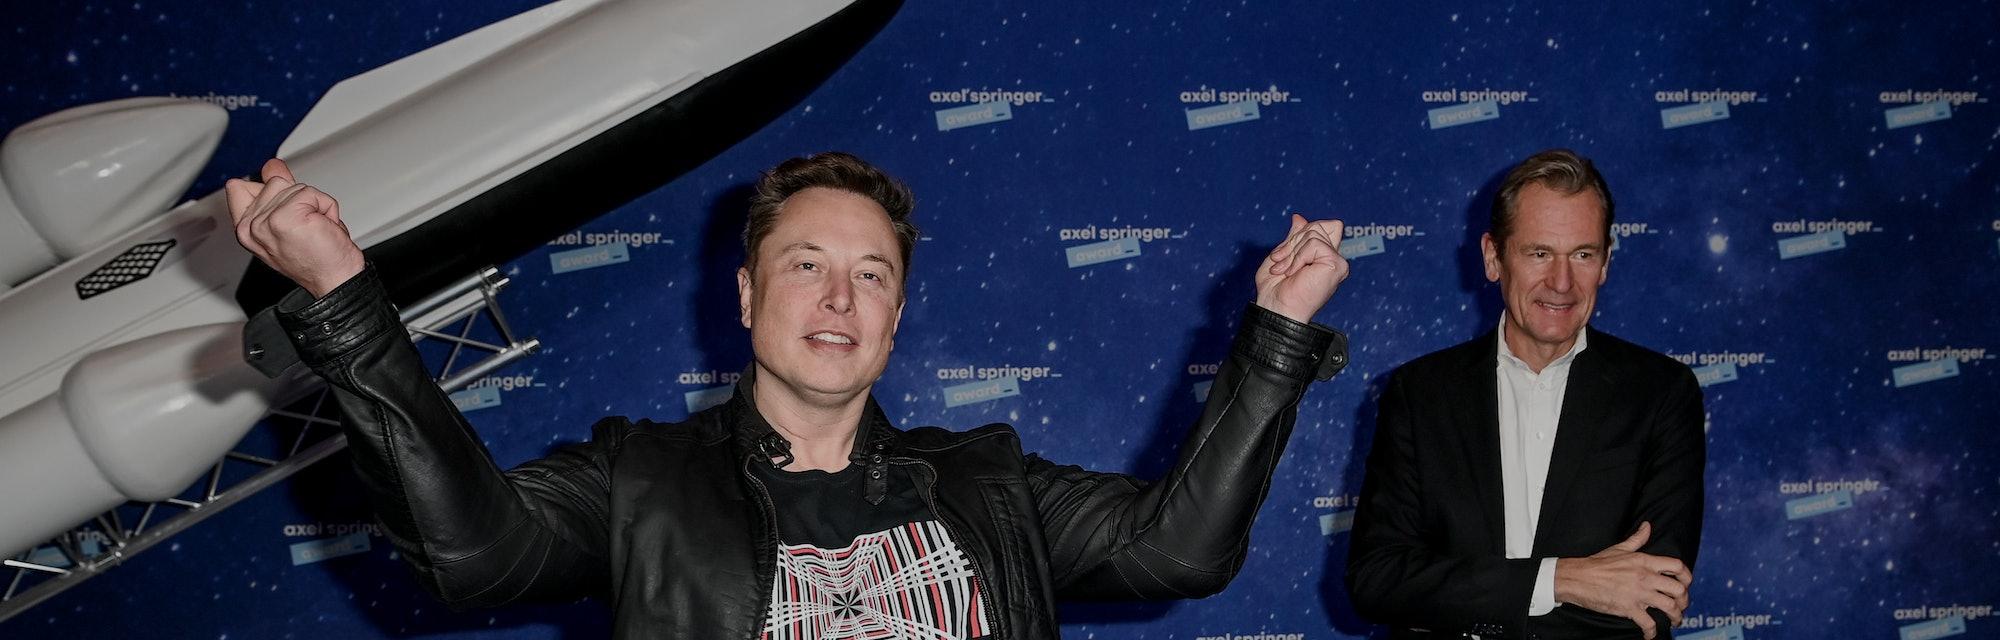 Tesla CEO Elon Musk stands in front of a model rocket.